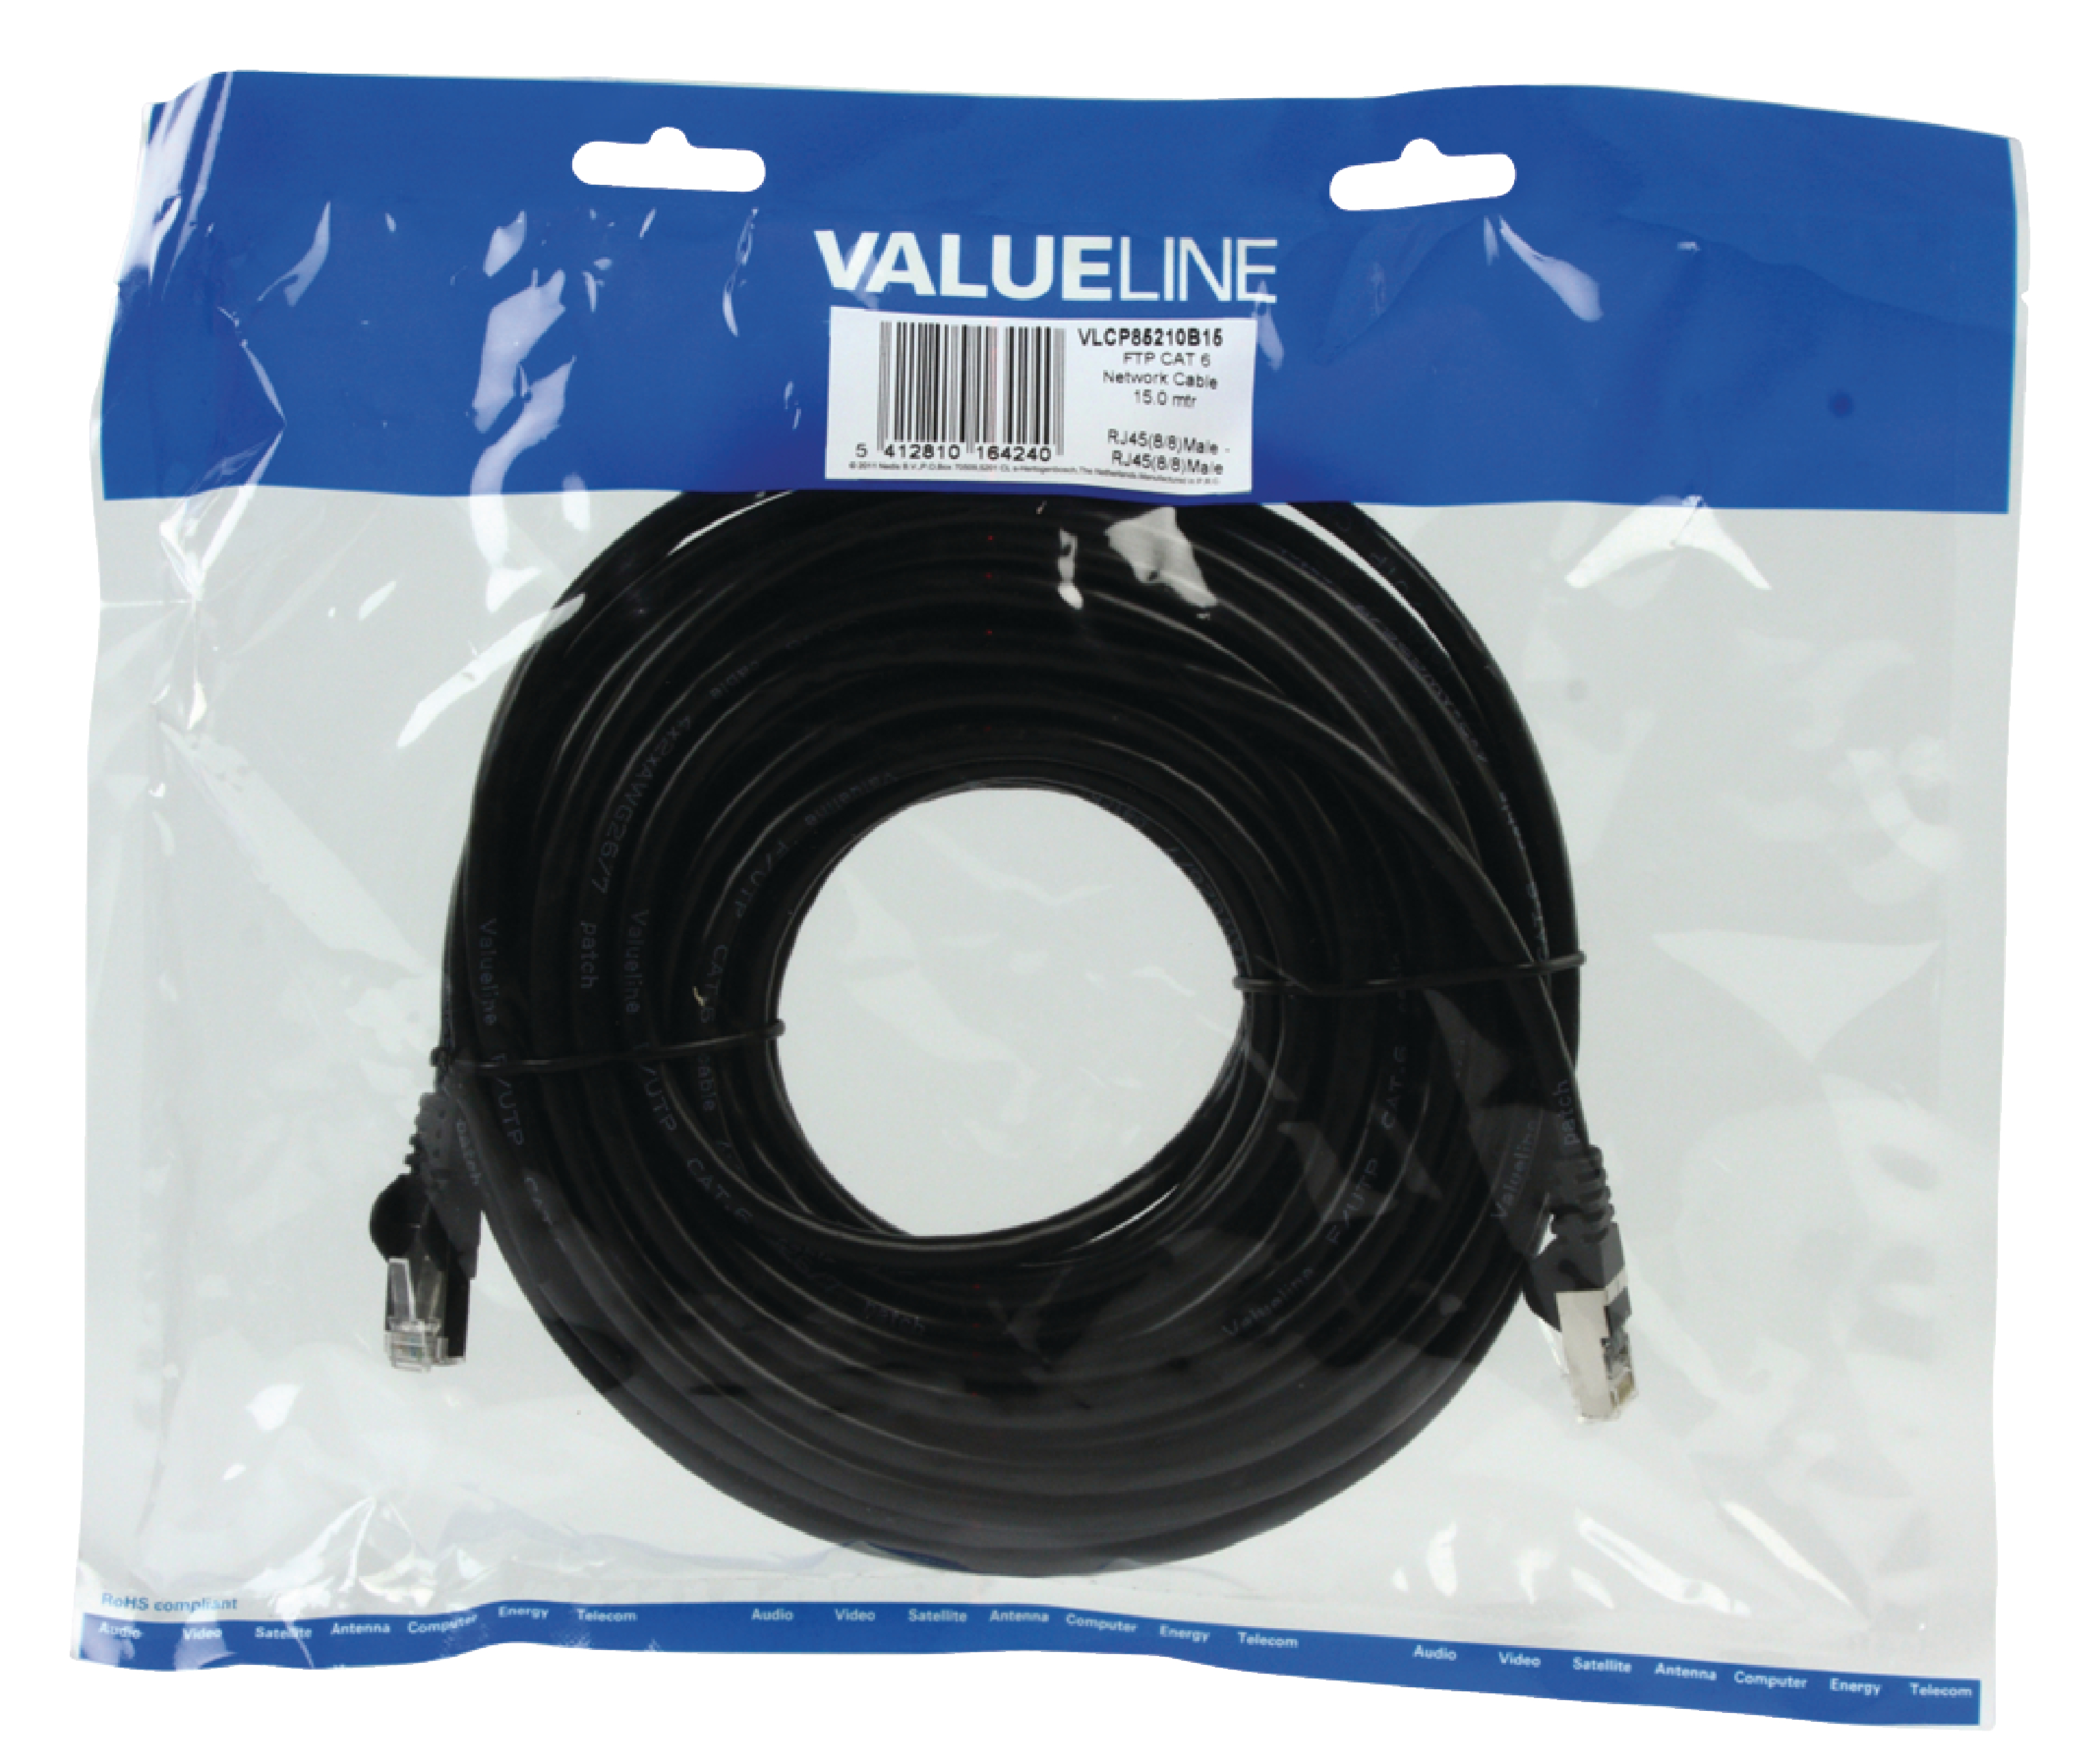 Valueline CAT6 F/UTP Netwerkkabel RJ45 (8/8) Male - RJ45 (8/8) Male 20.0 m Zwart